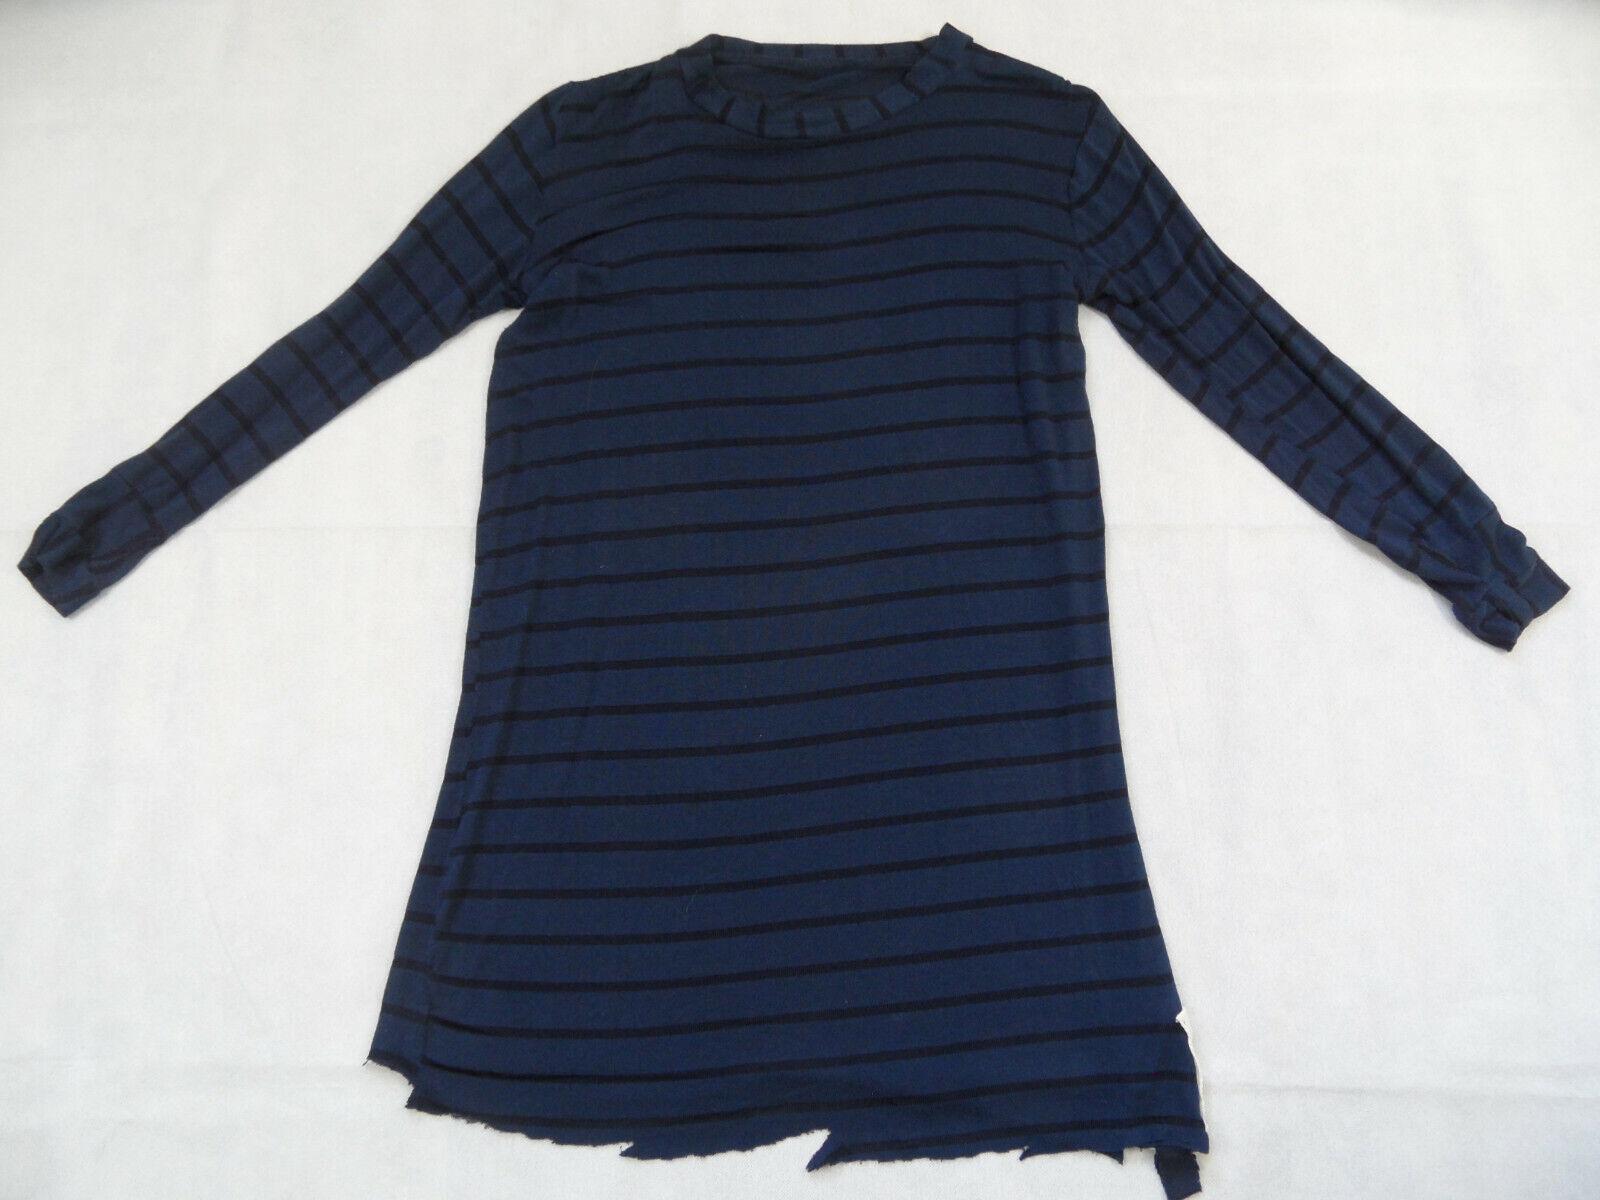 Wonderous Wonderous Wonderous la obra elegante larga camisa azul top je319 741f65